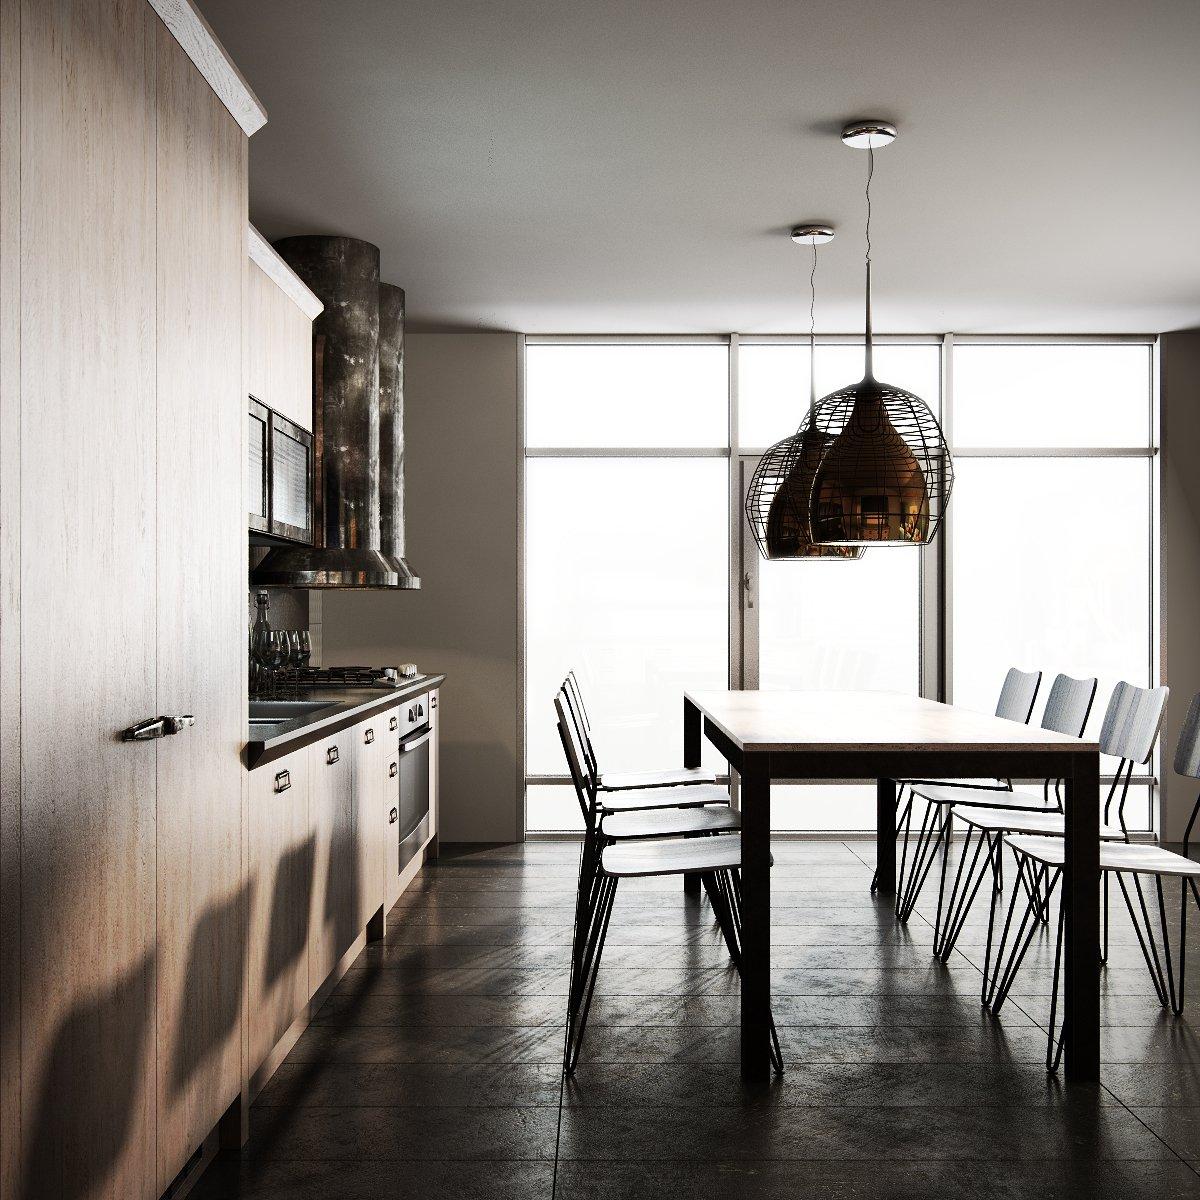 Scavolini diesel social kitchen type 002 3D Model in Kitchen 3DExport